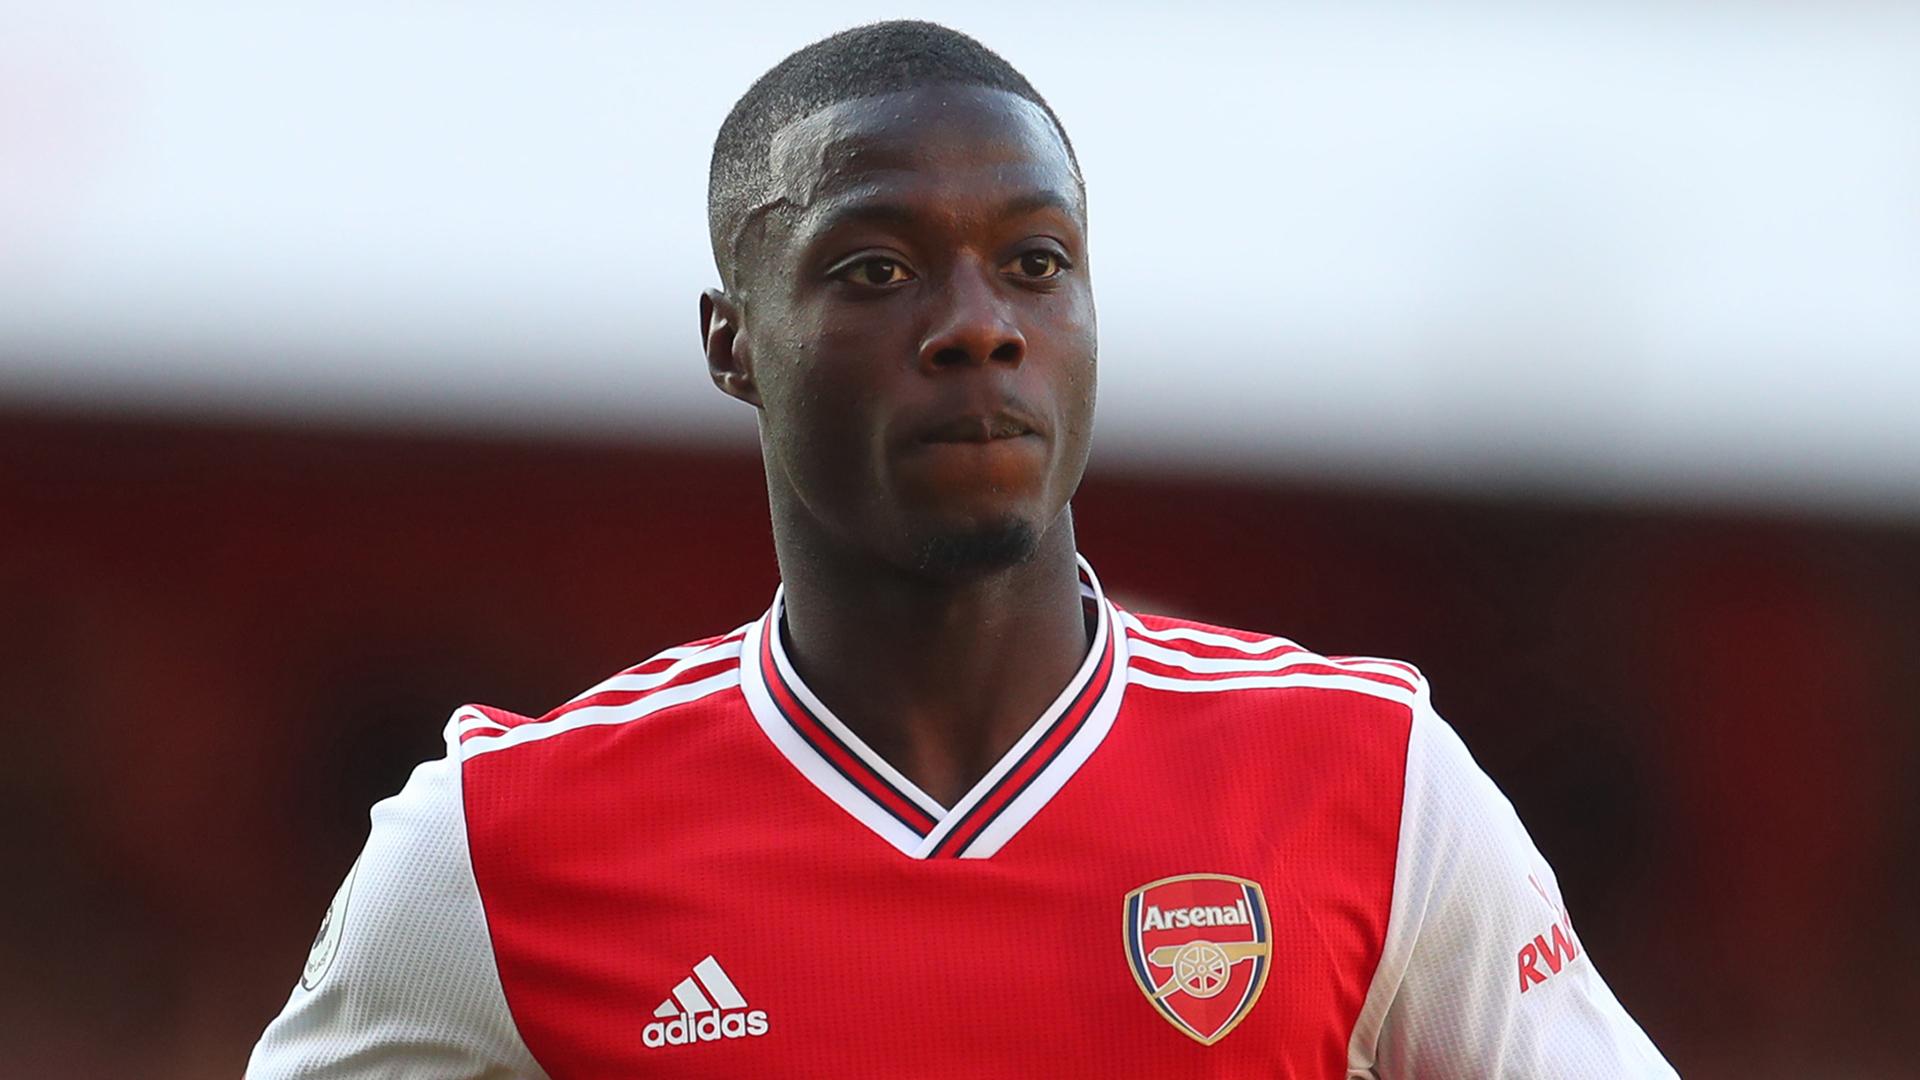 Arsenal boss Unai Emery reassures Nicolas Pepe over £72m transfer fee criticism